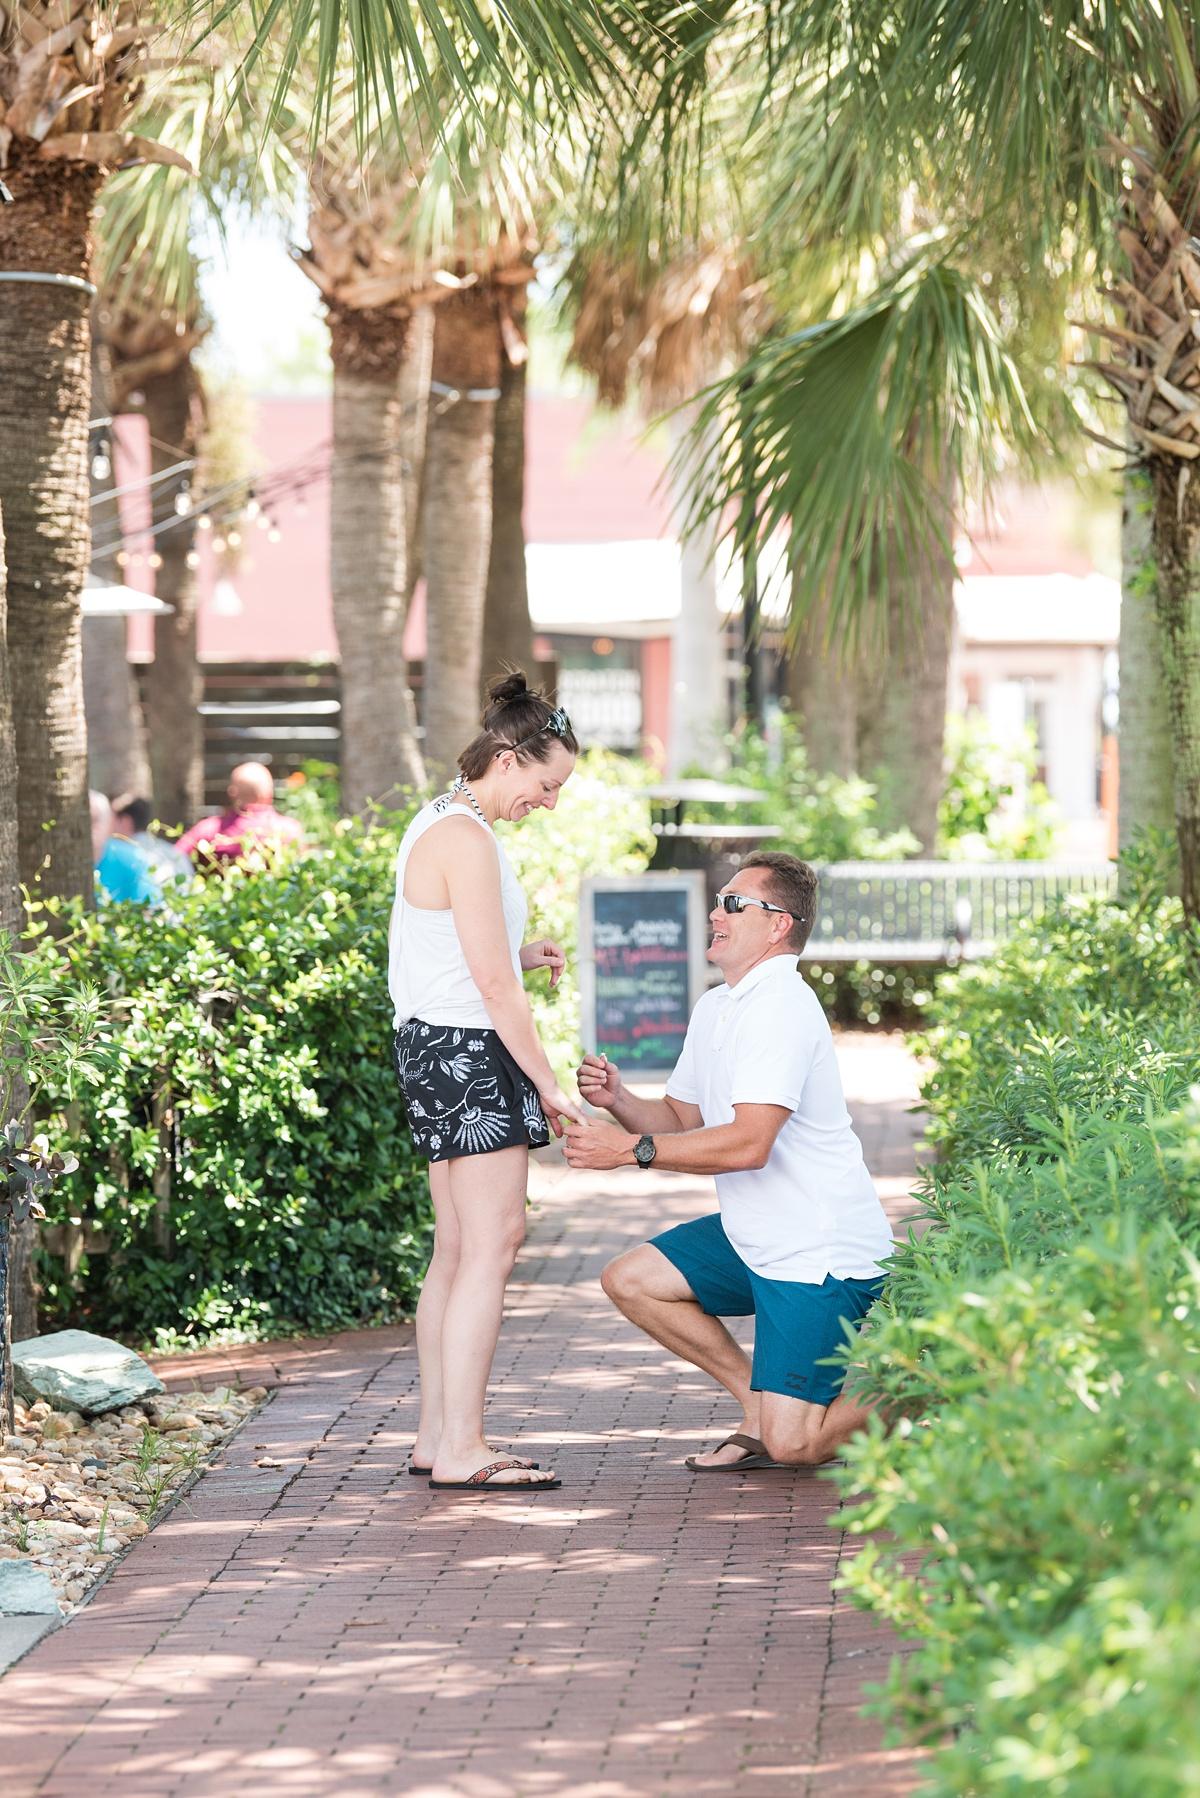 Atlantic Beach Proposal_Planning a Proposal_Jacksonville Florida Wedding Photographer_Engagement Portraits_1.jpg